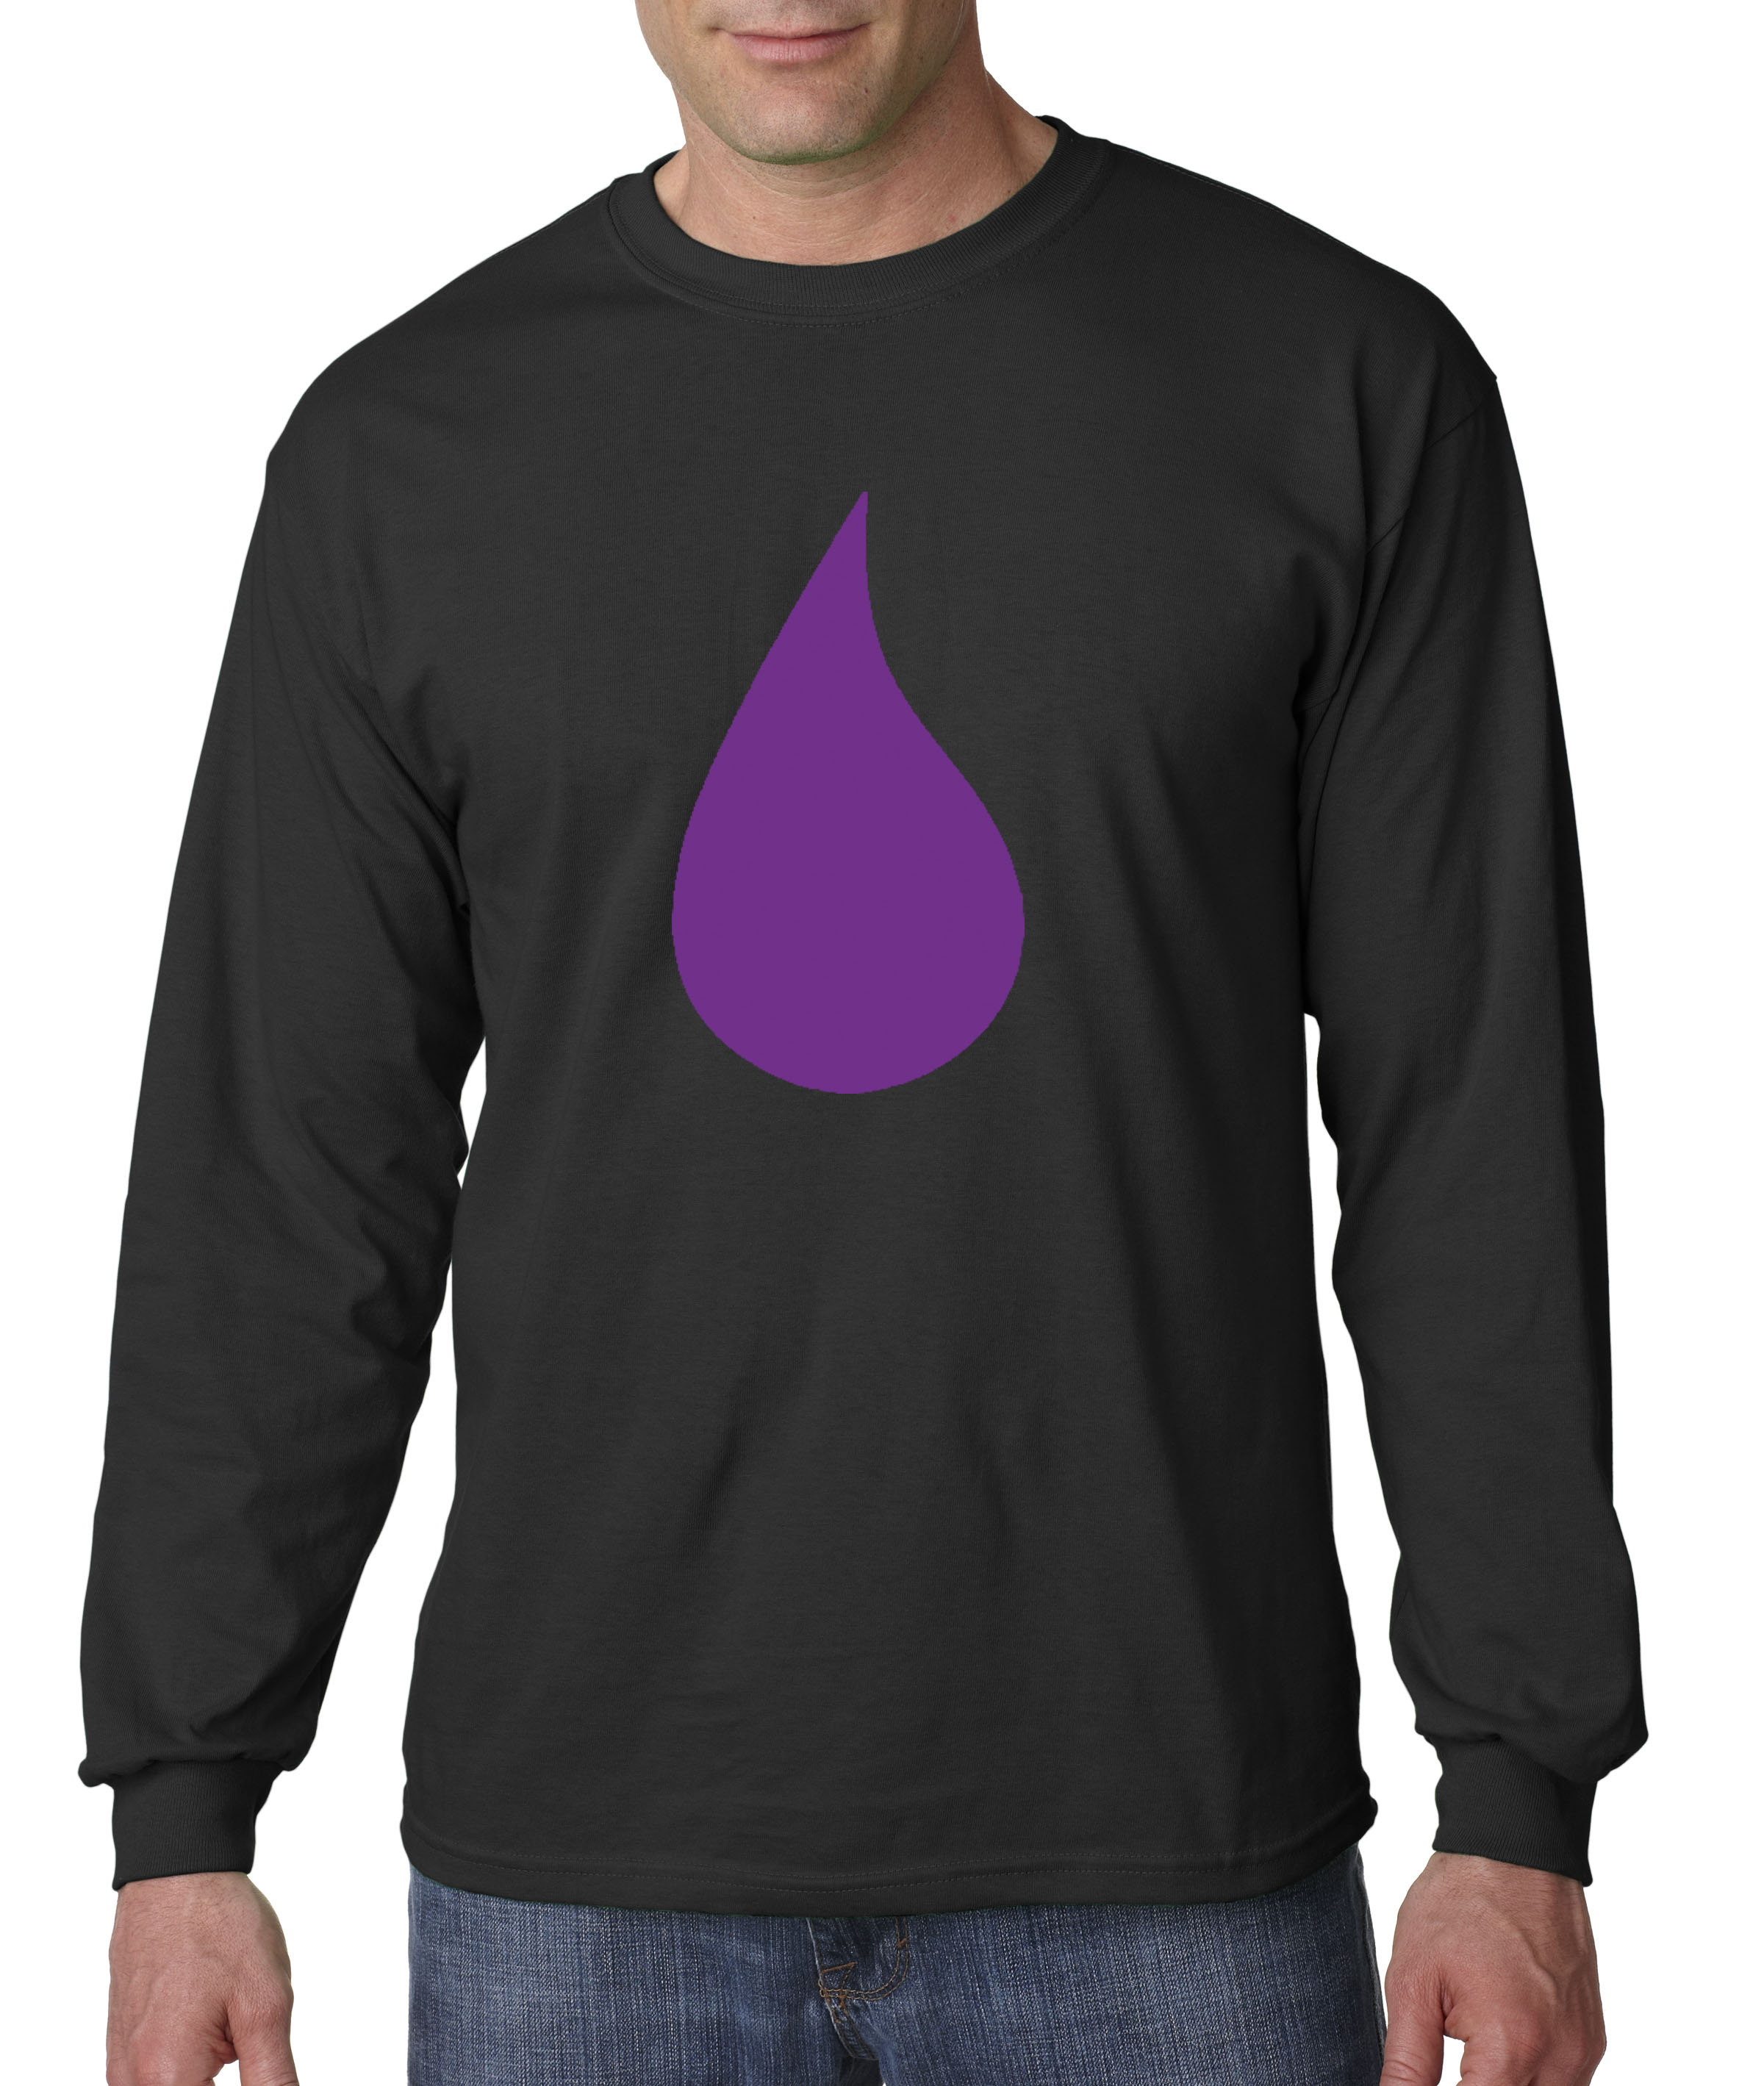 b2e82f96e 455 - Unisex Long-Sleeve T-Shirt Prince Purple Tear Rain Drop Peace Love Rip